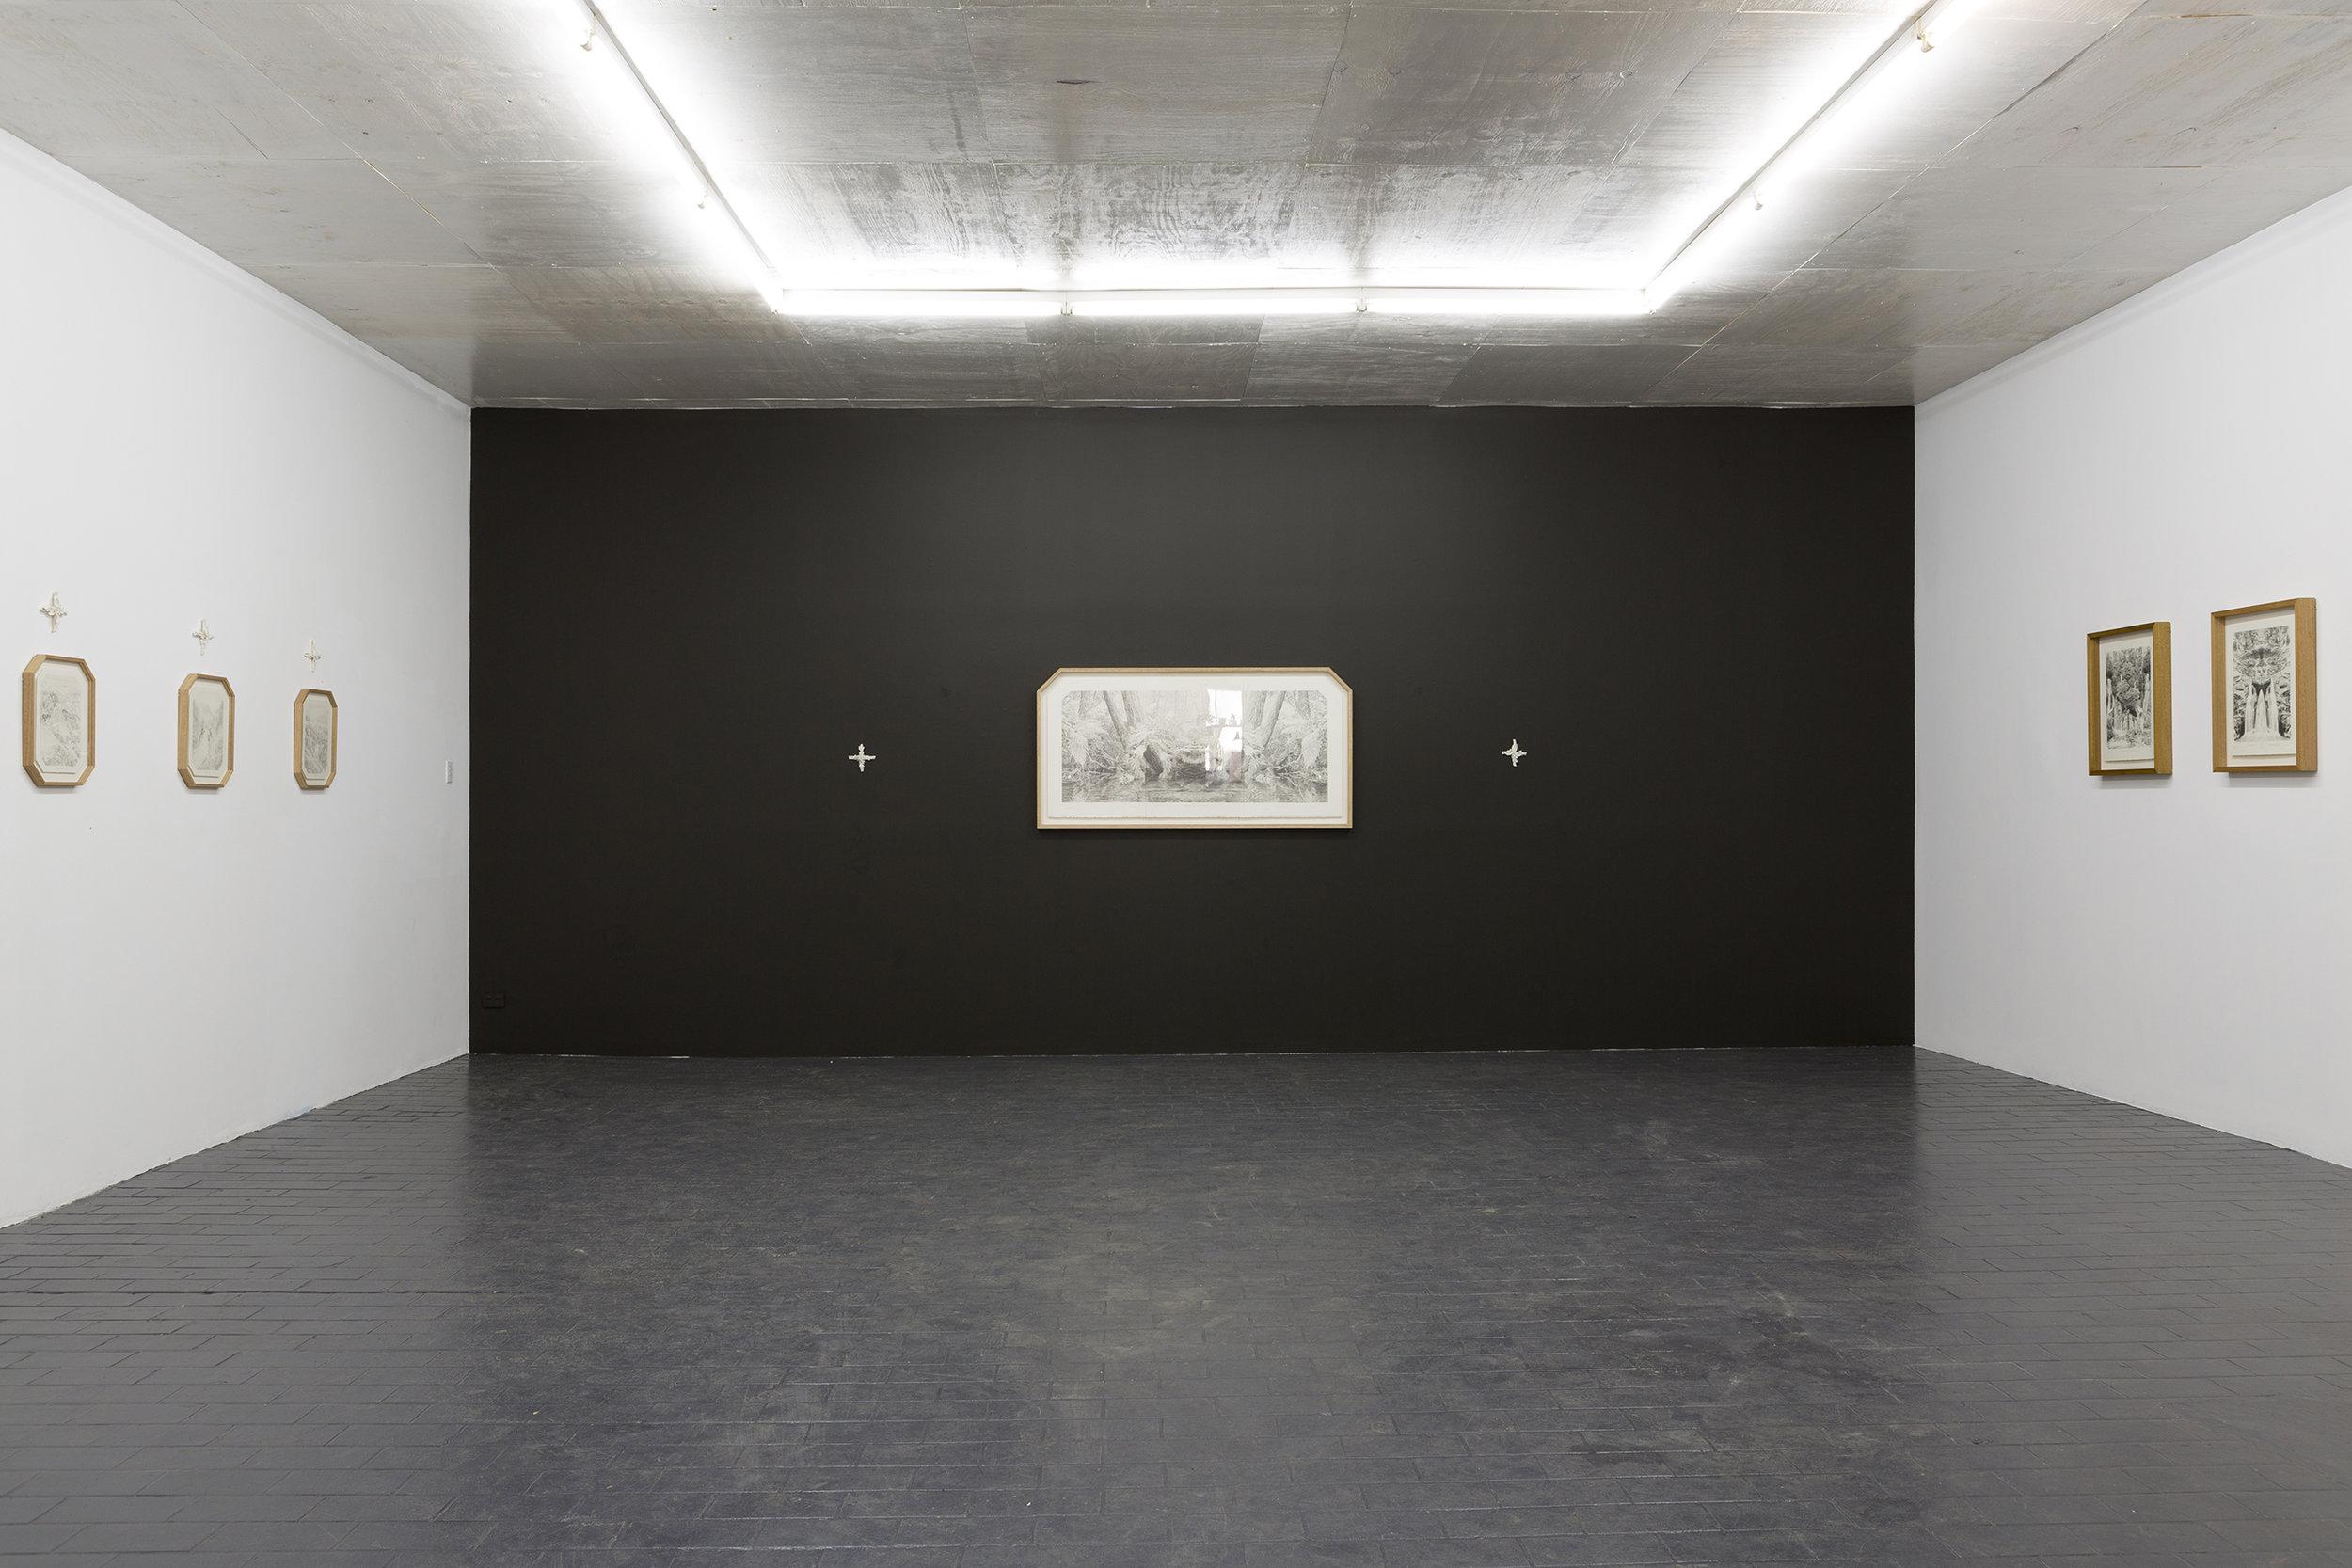 becc-orszag-exhibition-view-1.jpg